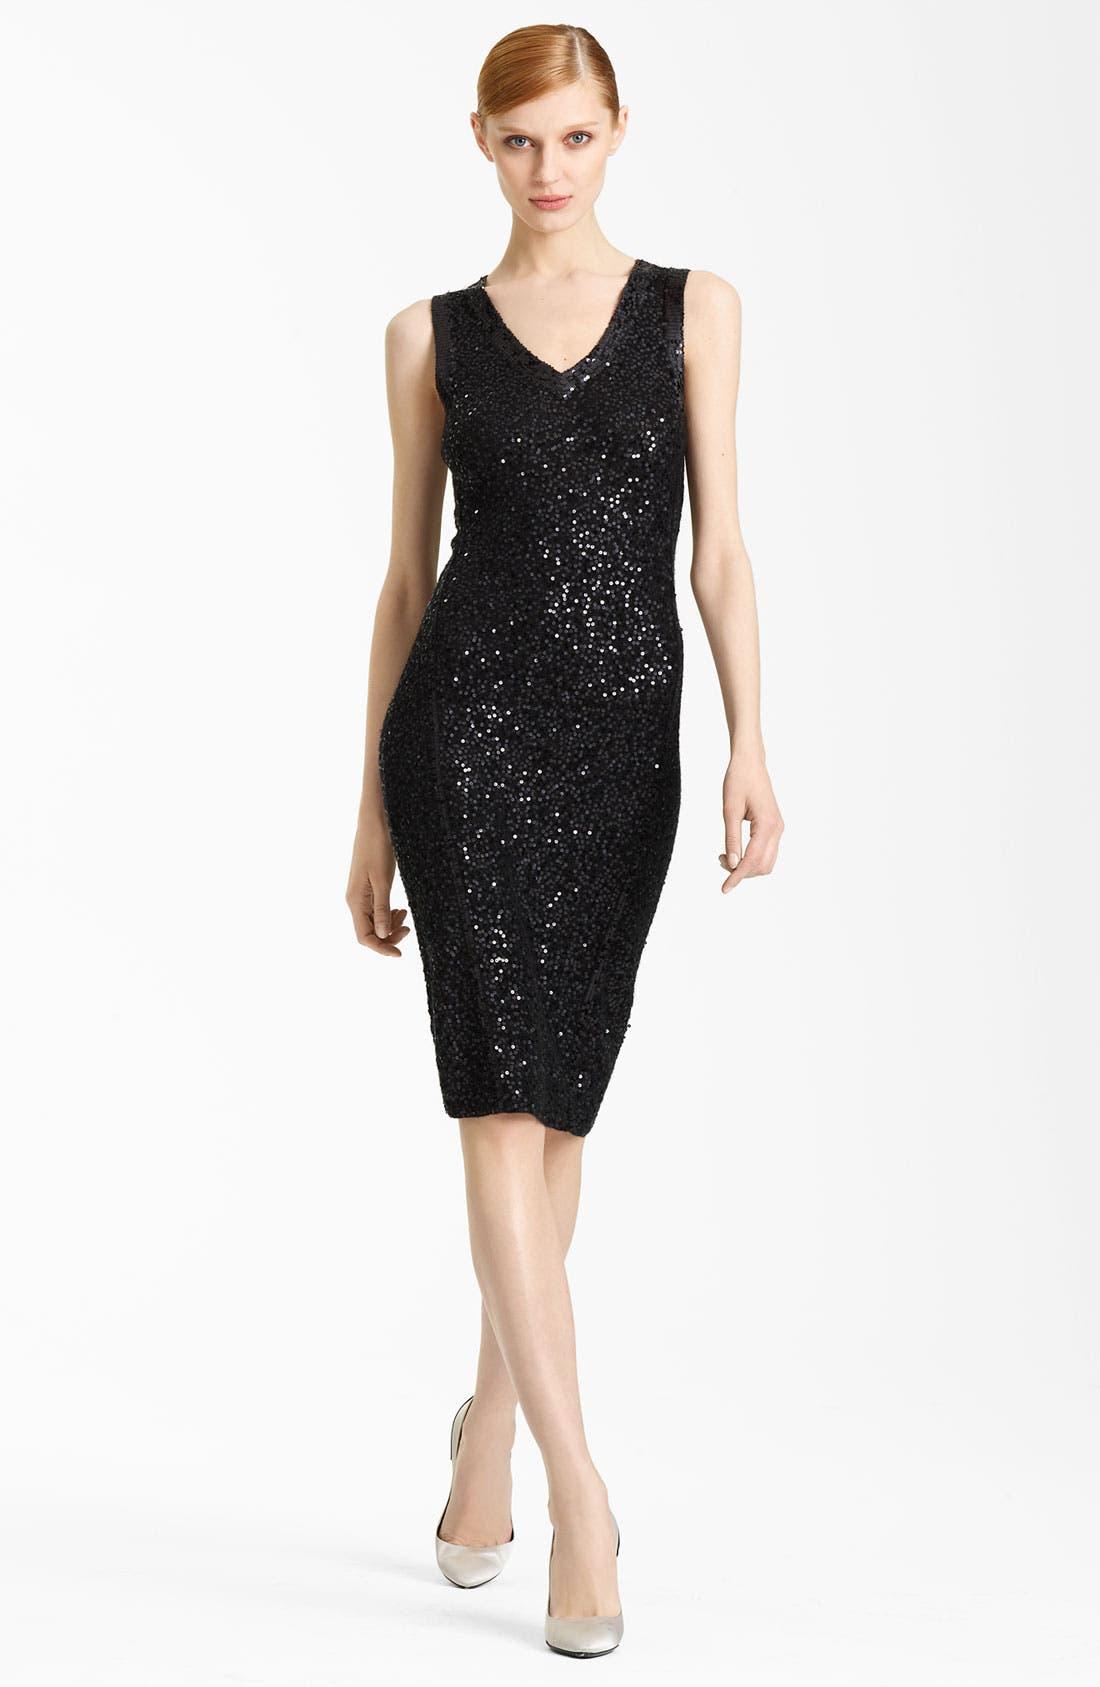 Alternate Image 1 Selected - Donna Karan Collection Sleeveless Sequin Dress